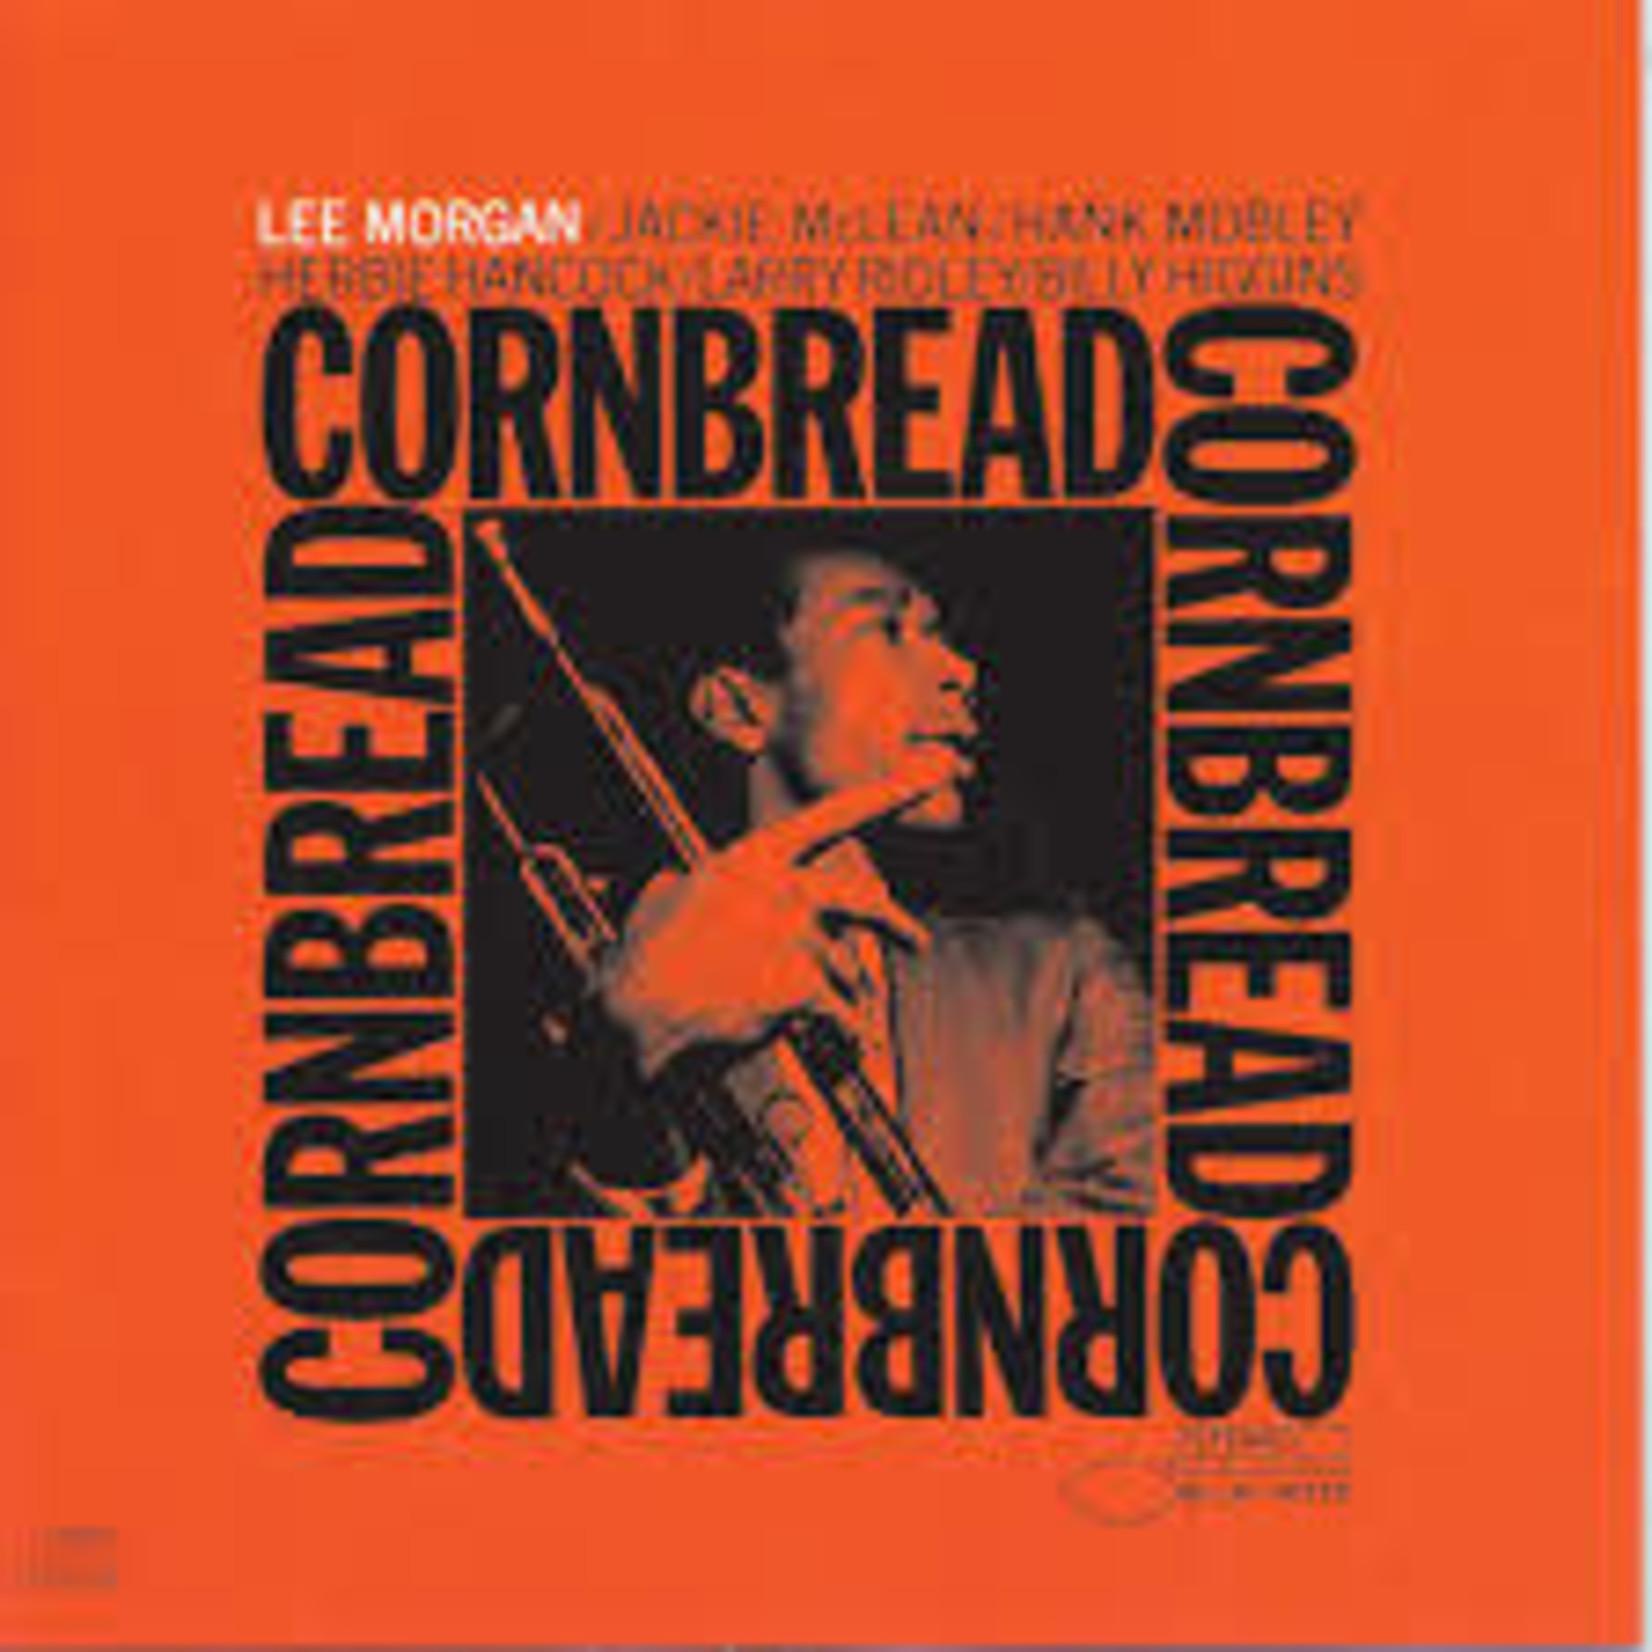 Vinyl Lee Morgan - Cornbread